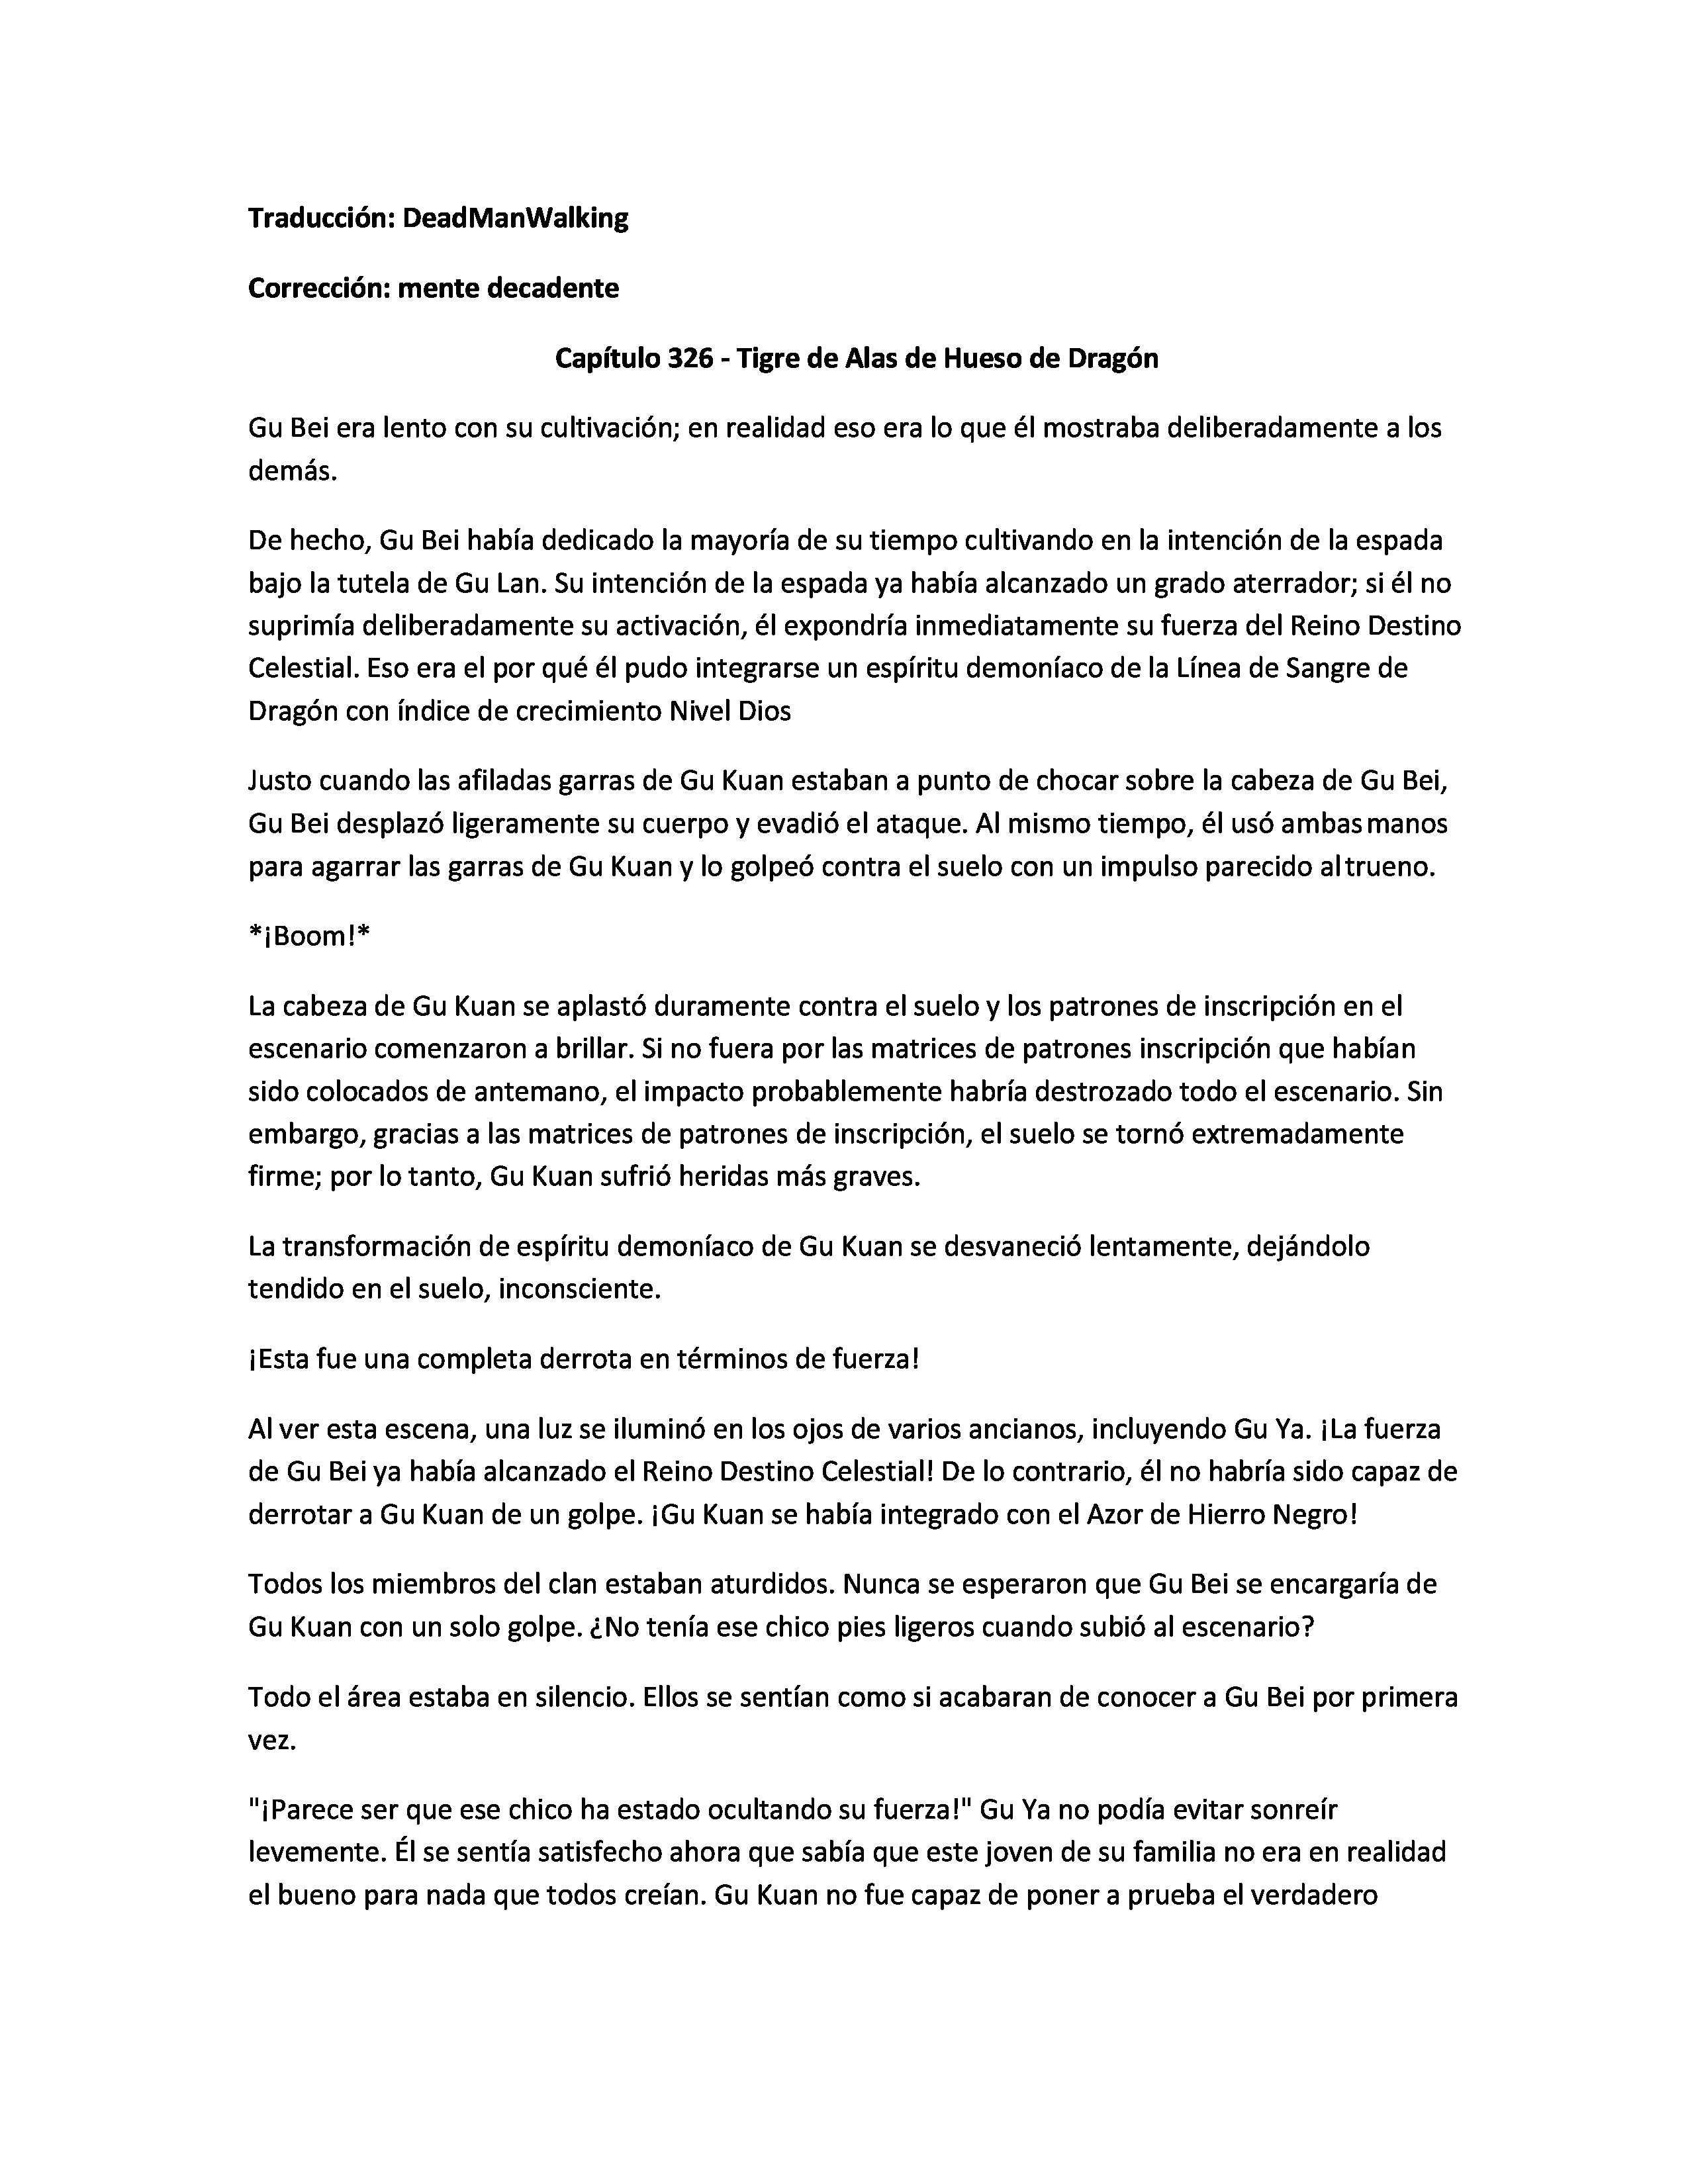 http://c5.ninemanga.com/es_manga/pic2/44/20012/506288/4aa235219753273941bab0a2b1b3adff.jpg Page 1